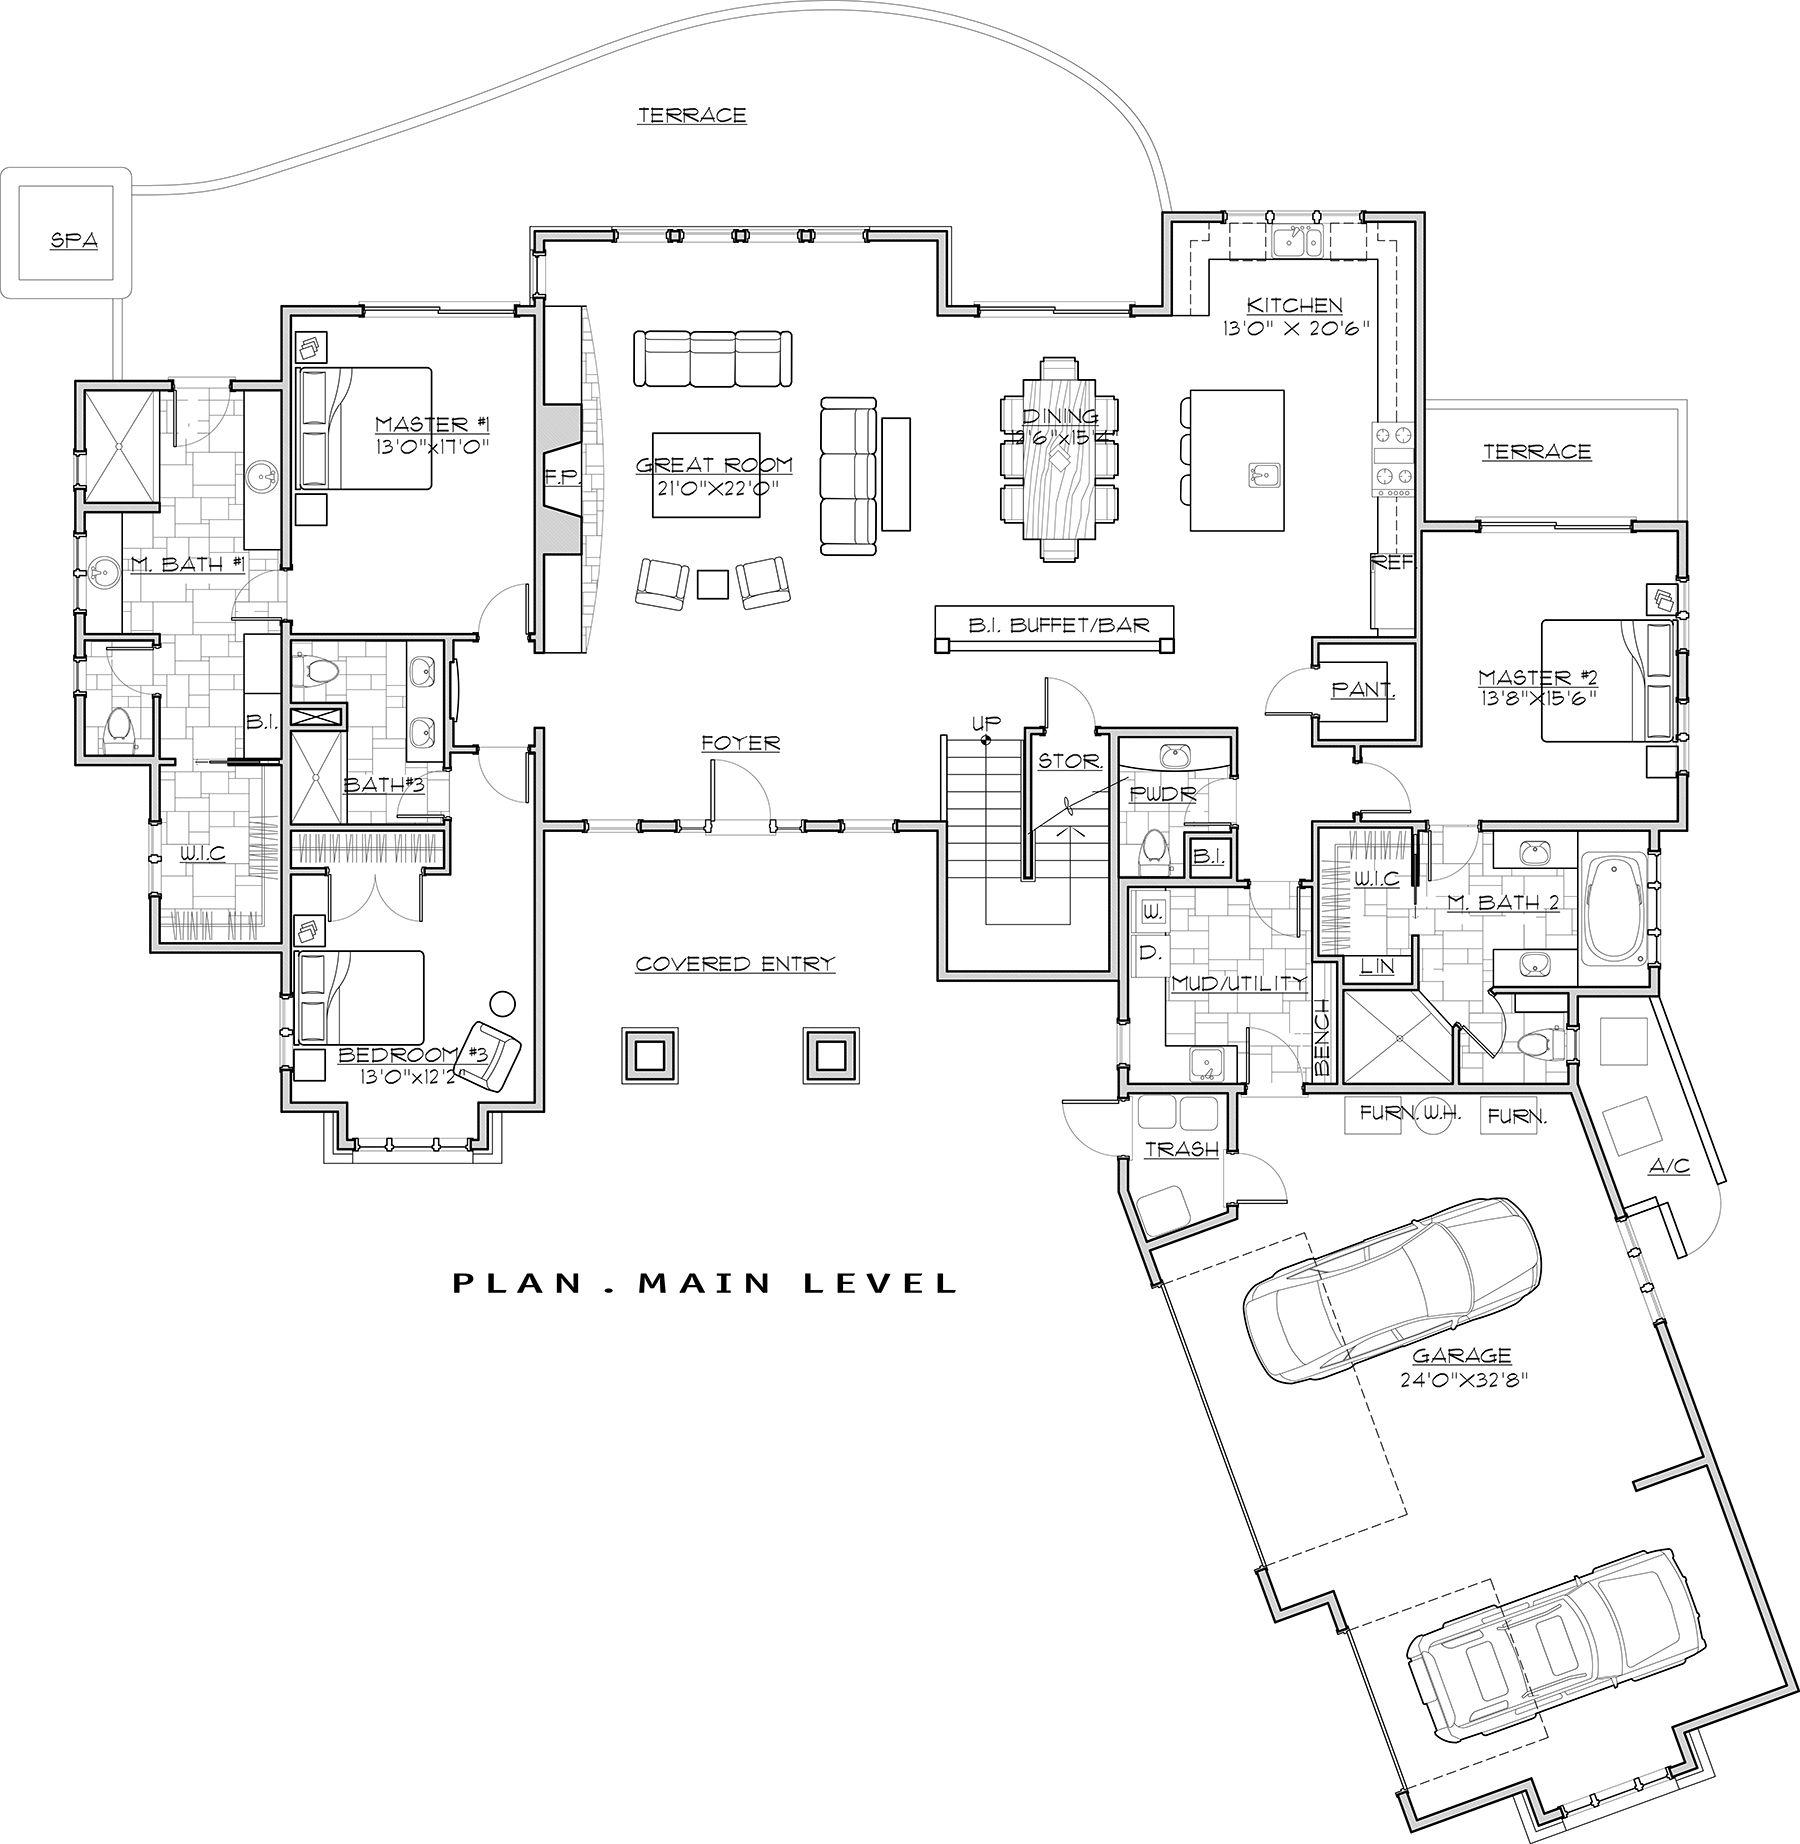 House Plan 5829 00026 Mountain Rustic Plan 4 412 Square